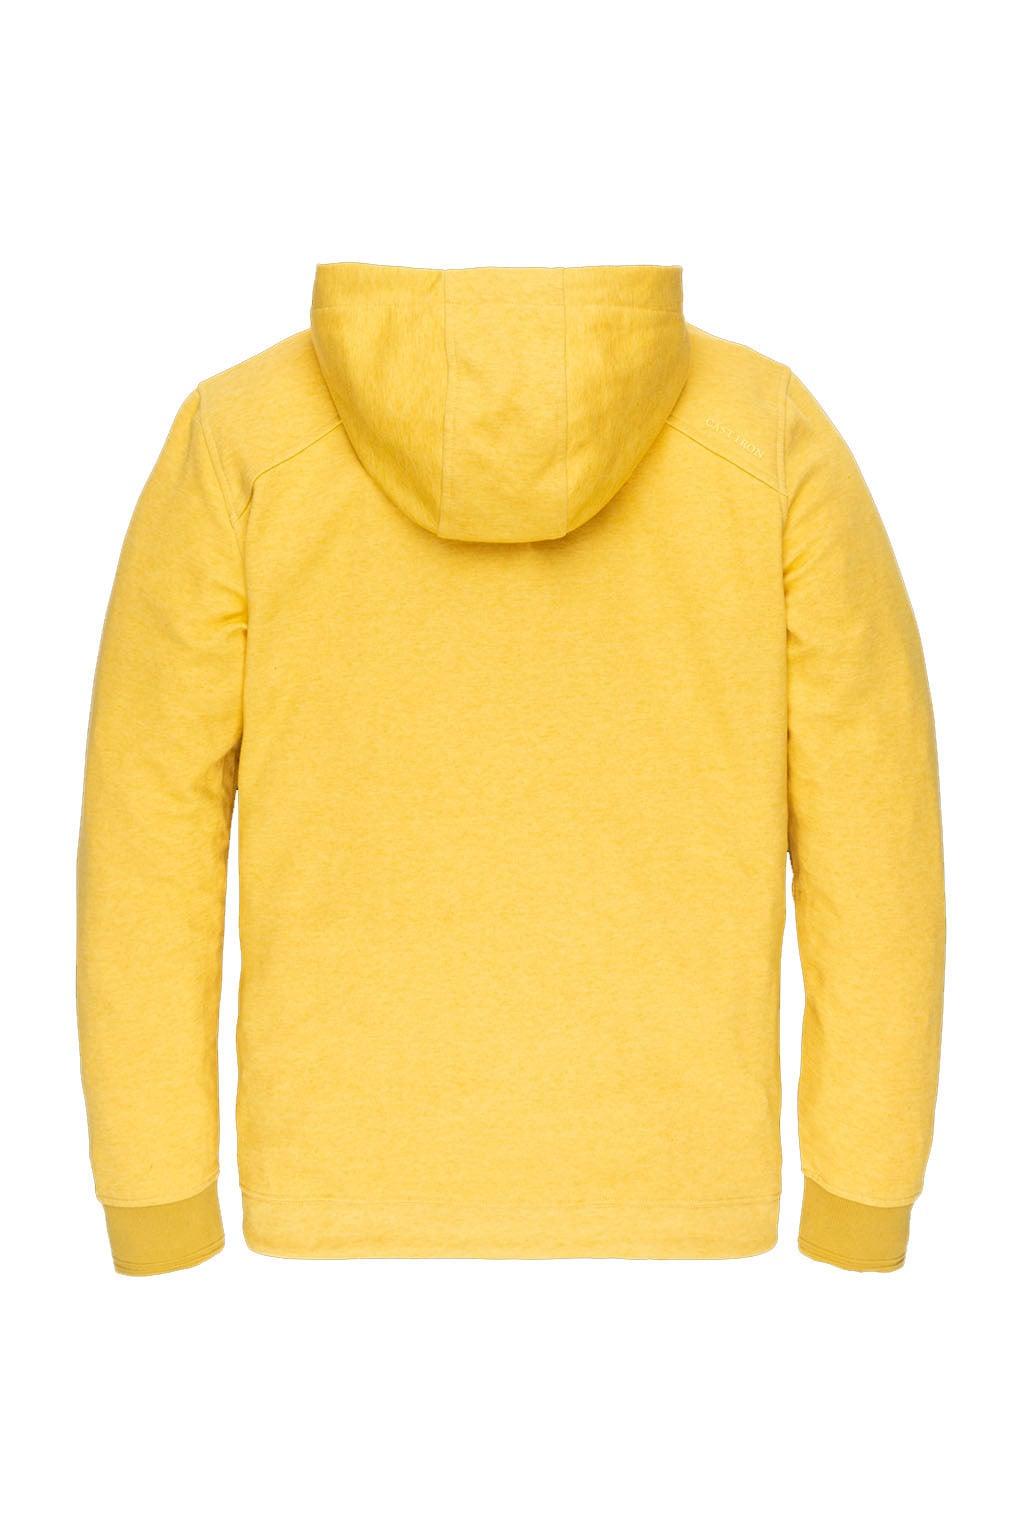 Cast iron sweater geel M Cast iron sweater geel